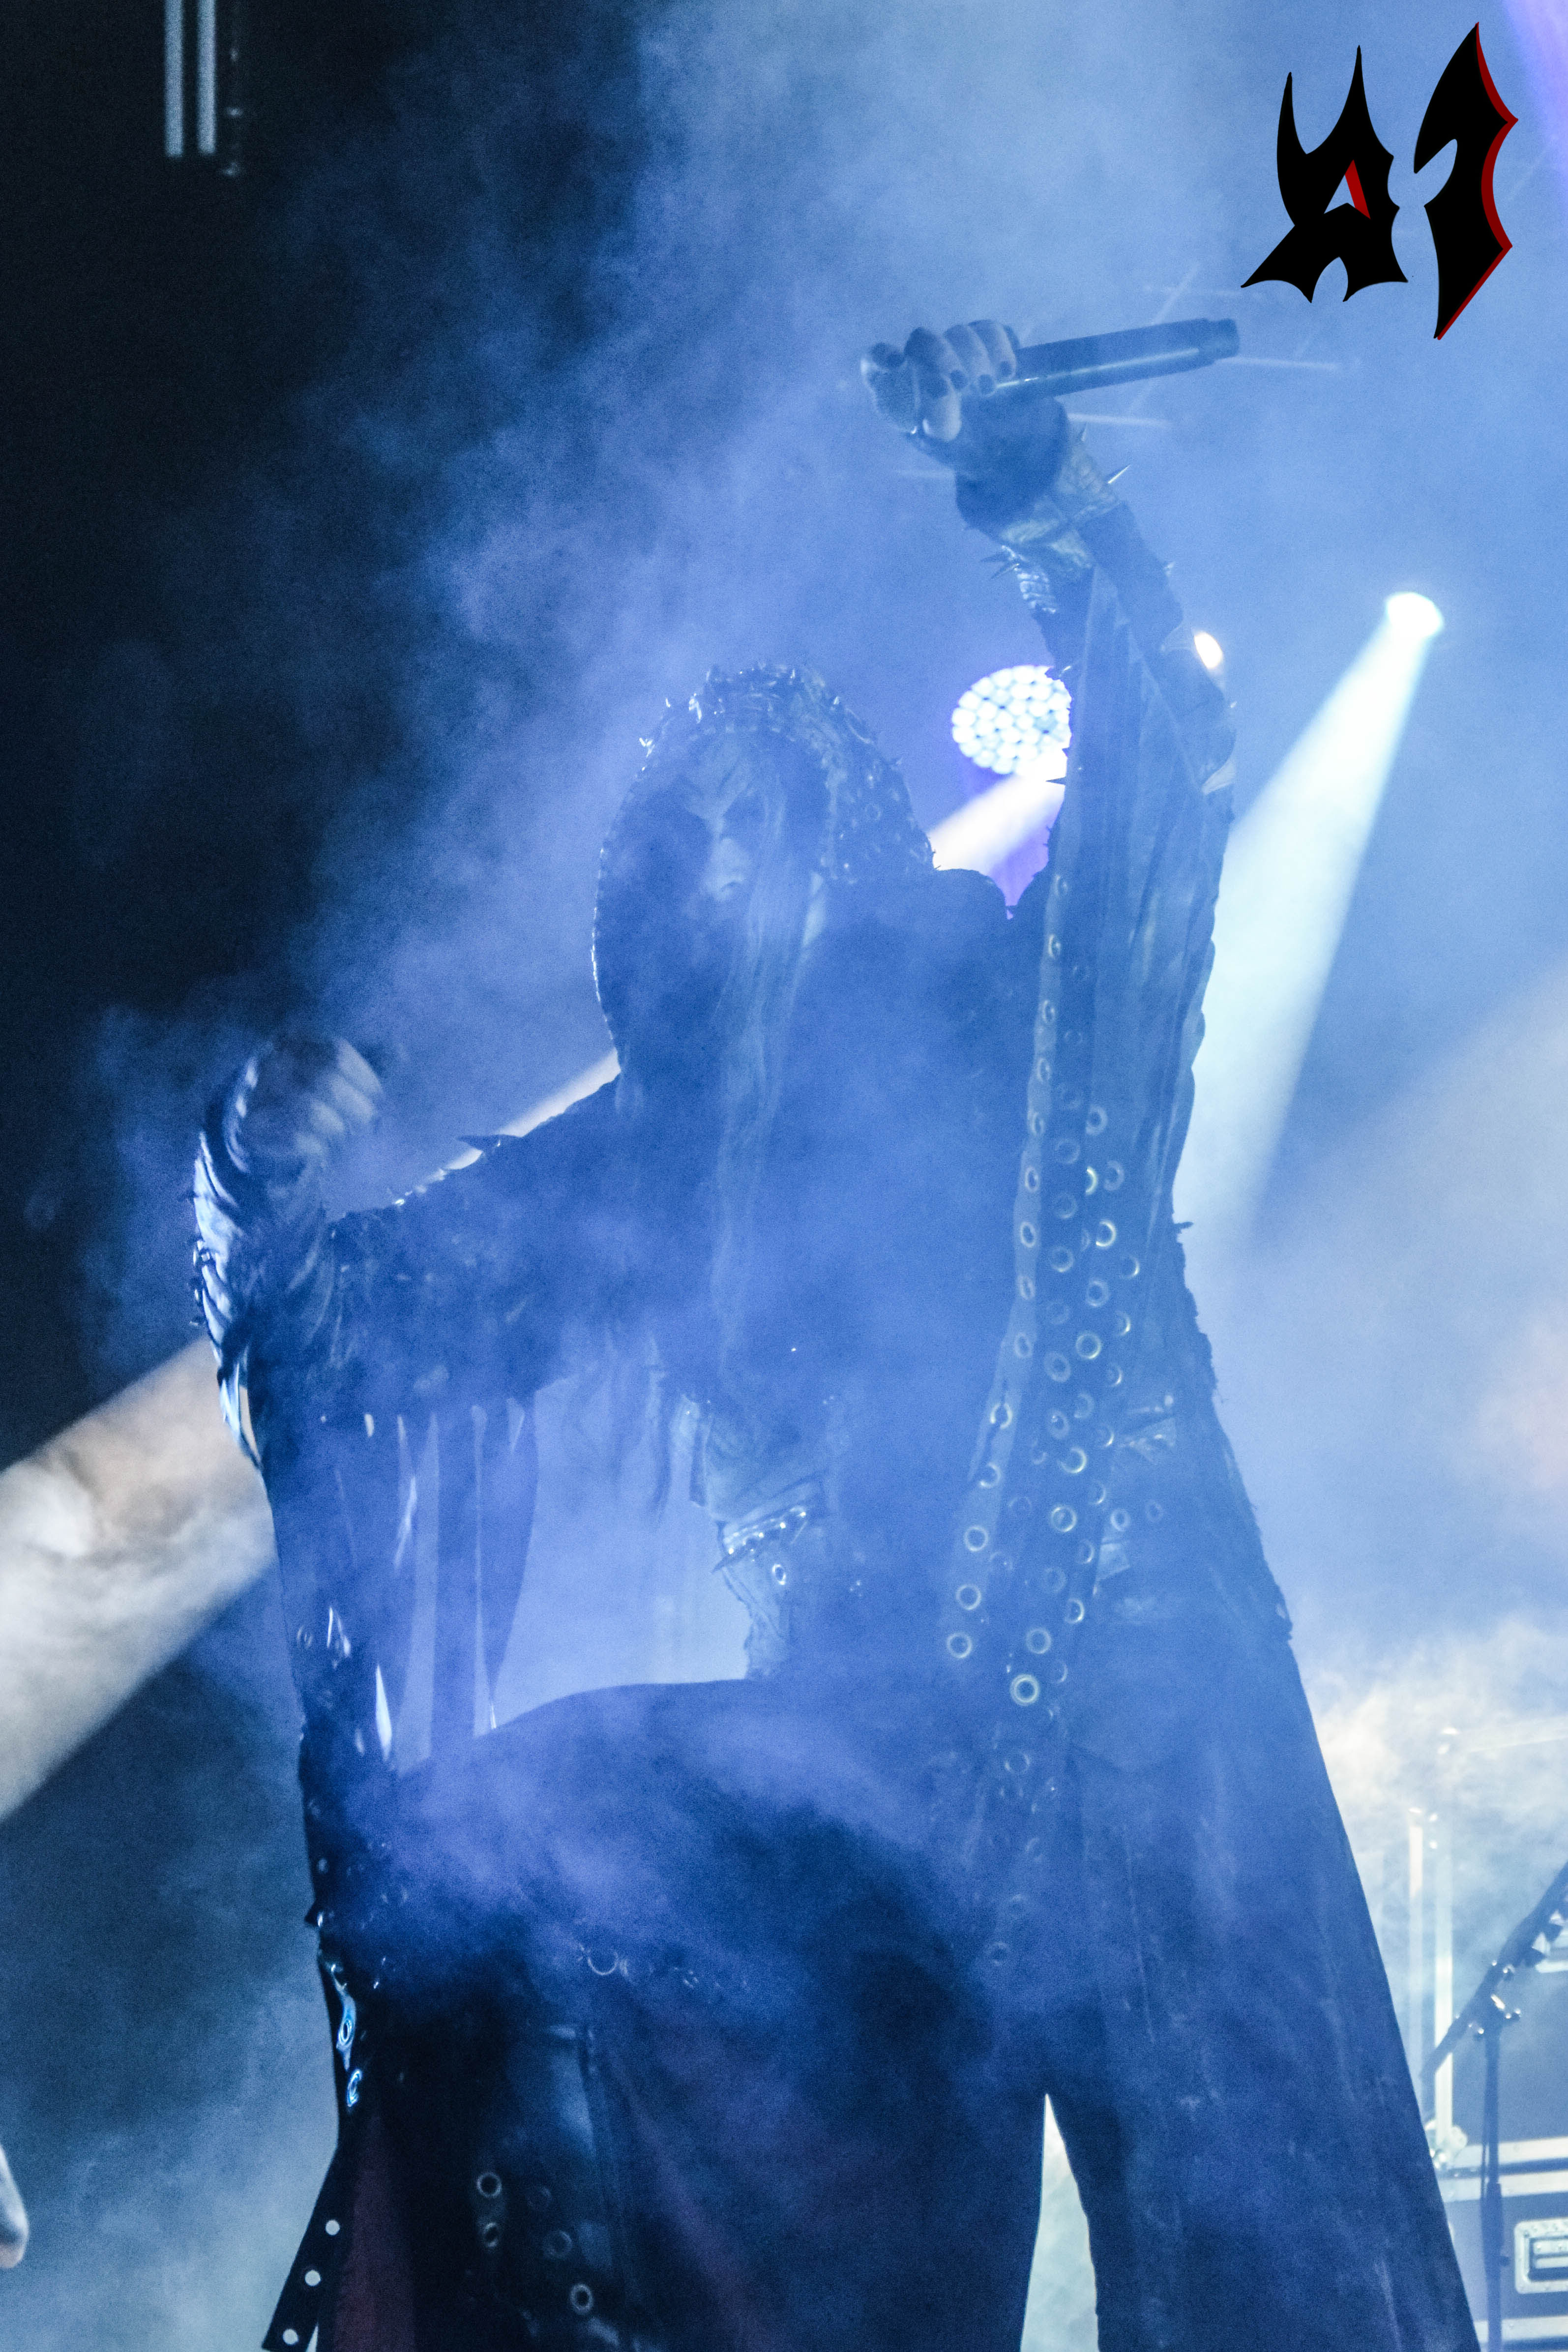 Hellfest - Jour 2 - Dimmu Borgir 21